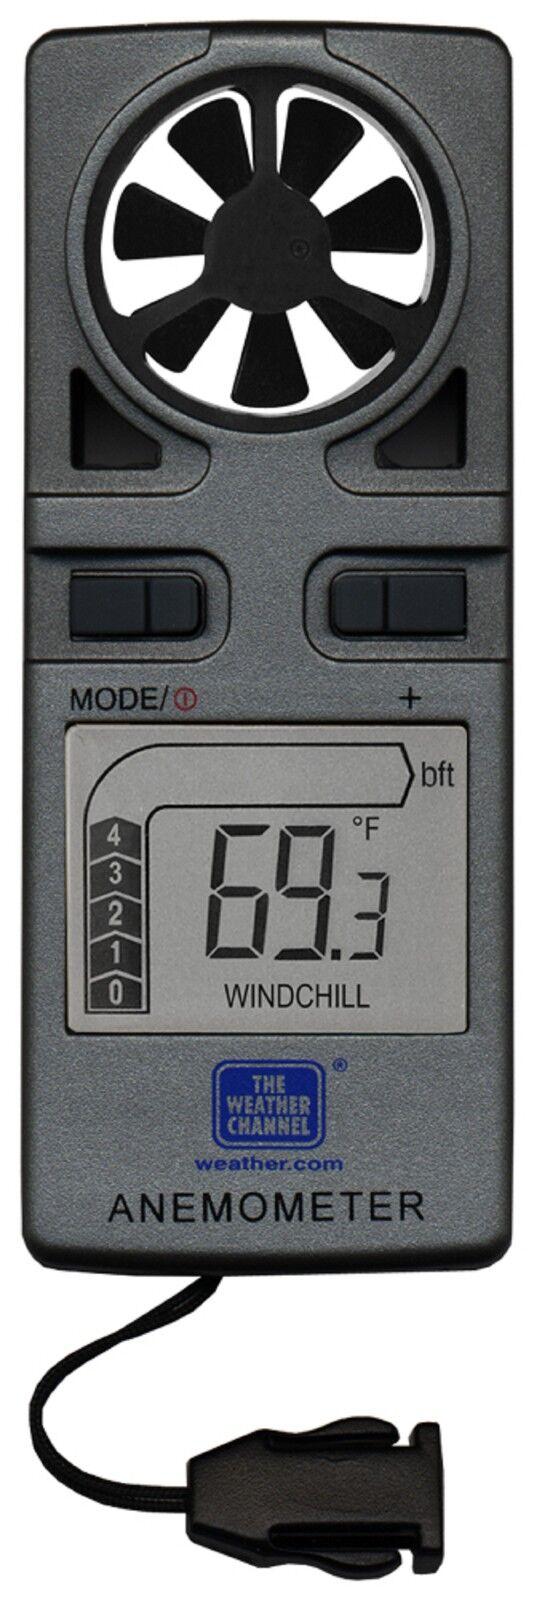 EA-3010TWC La Crosse Technology TWC Handheld Anemometer LED Backlight Neck Strap